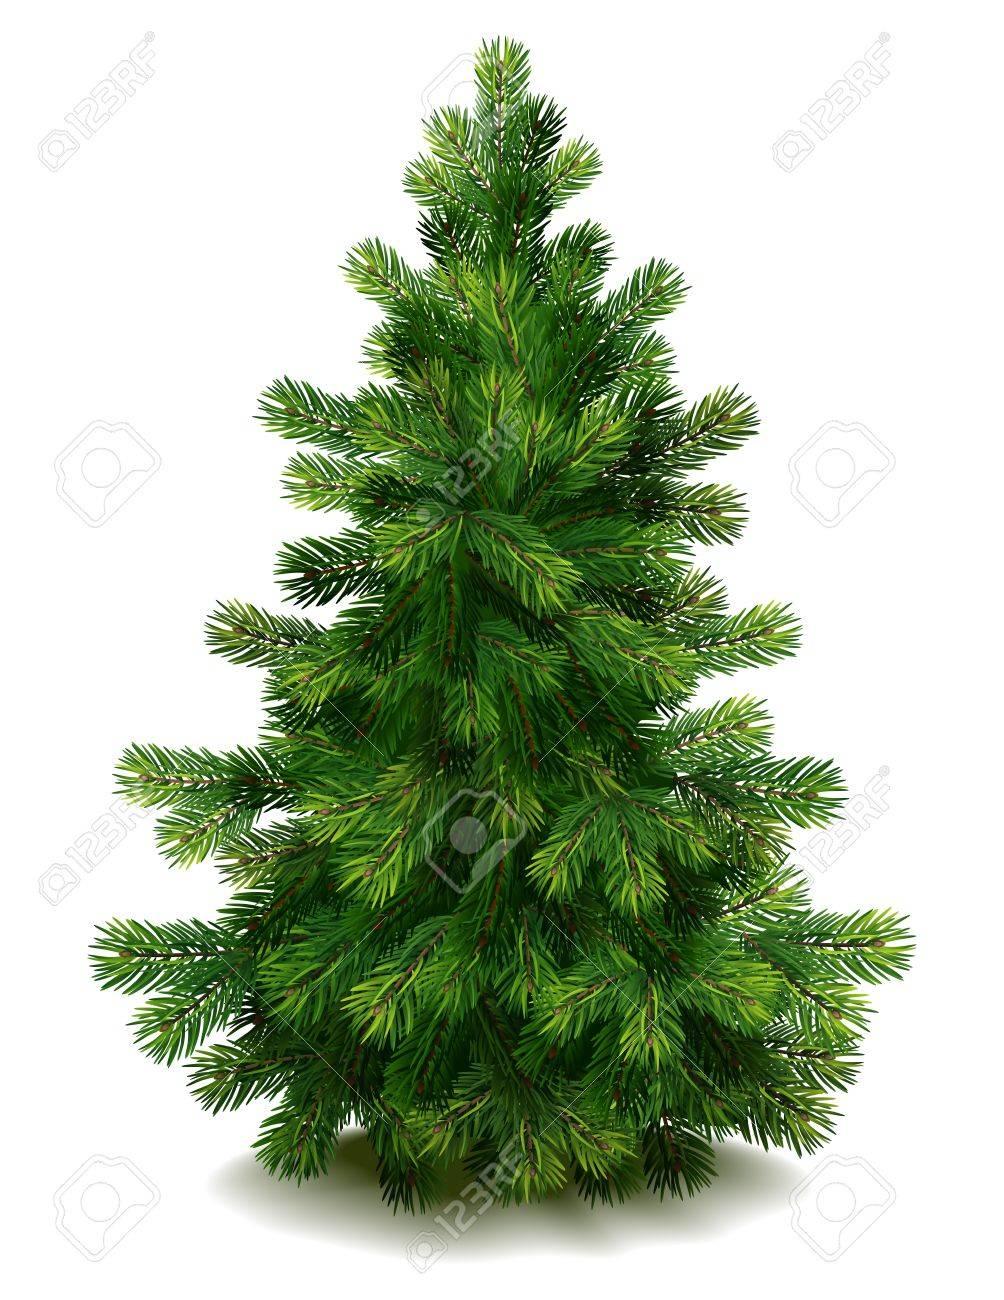 Vector illustration - pine tree on white background - 10627294